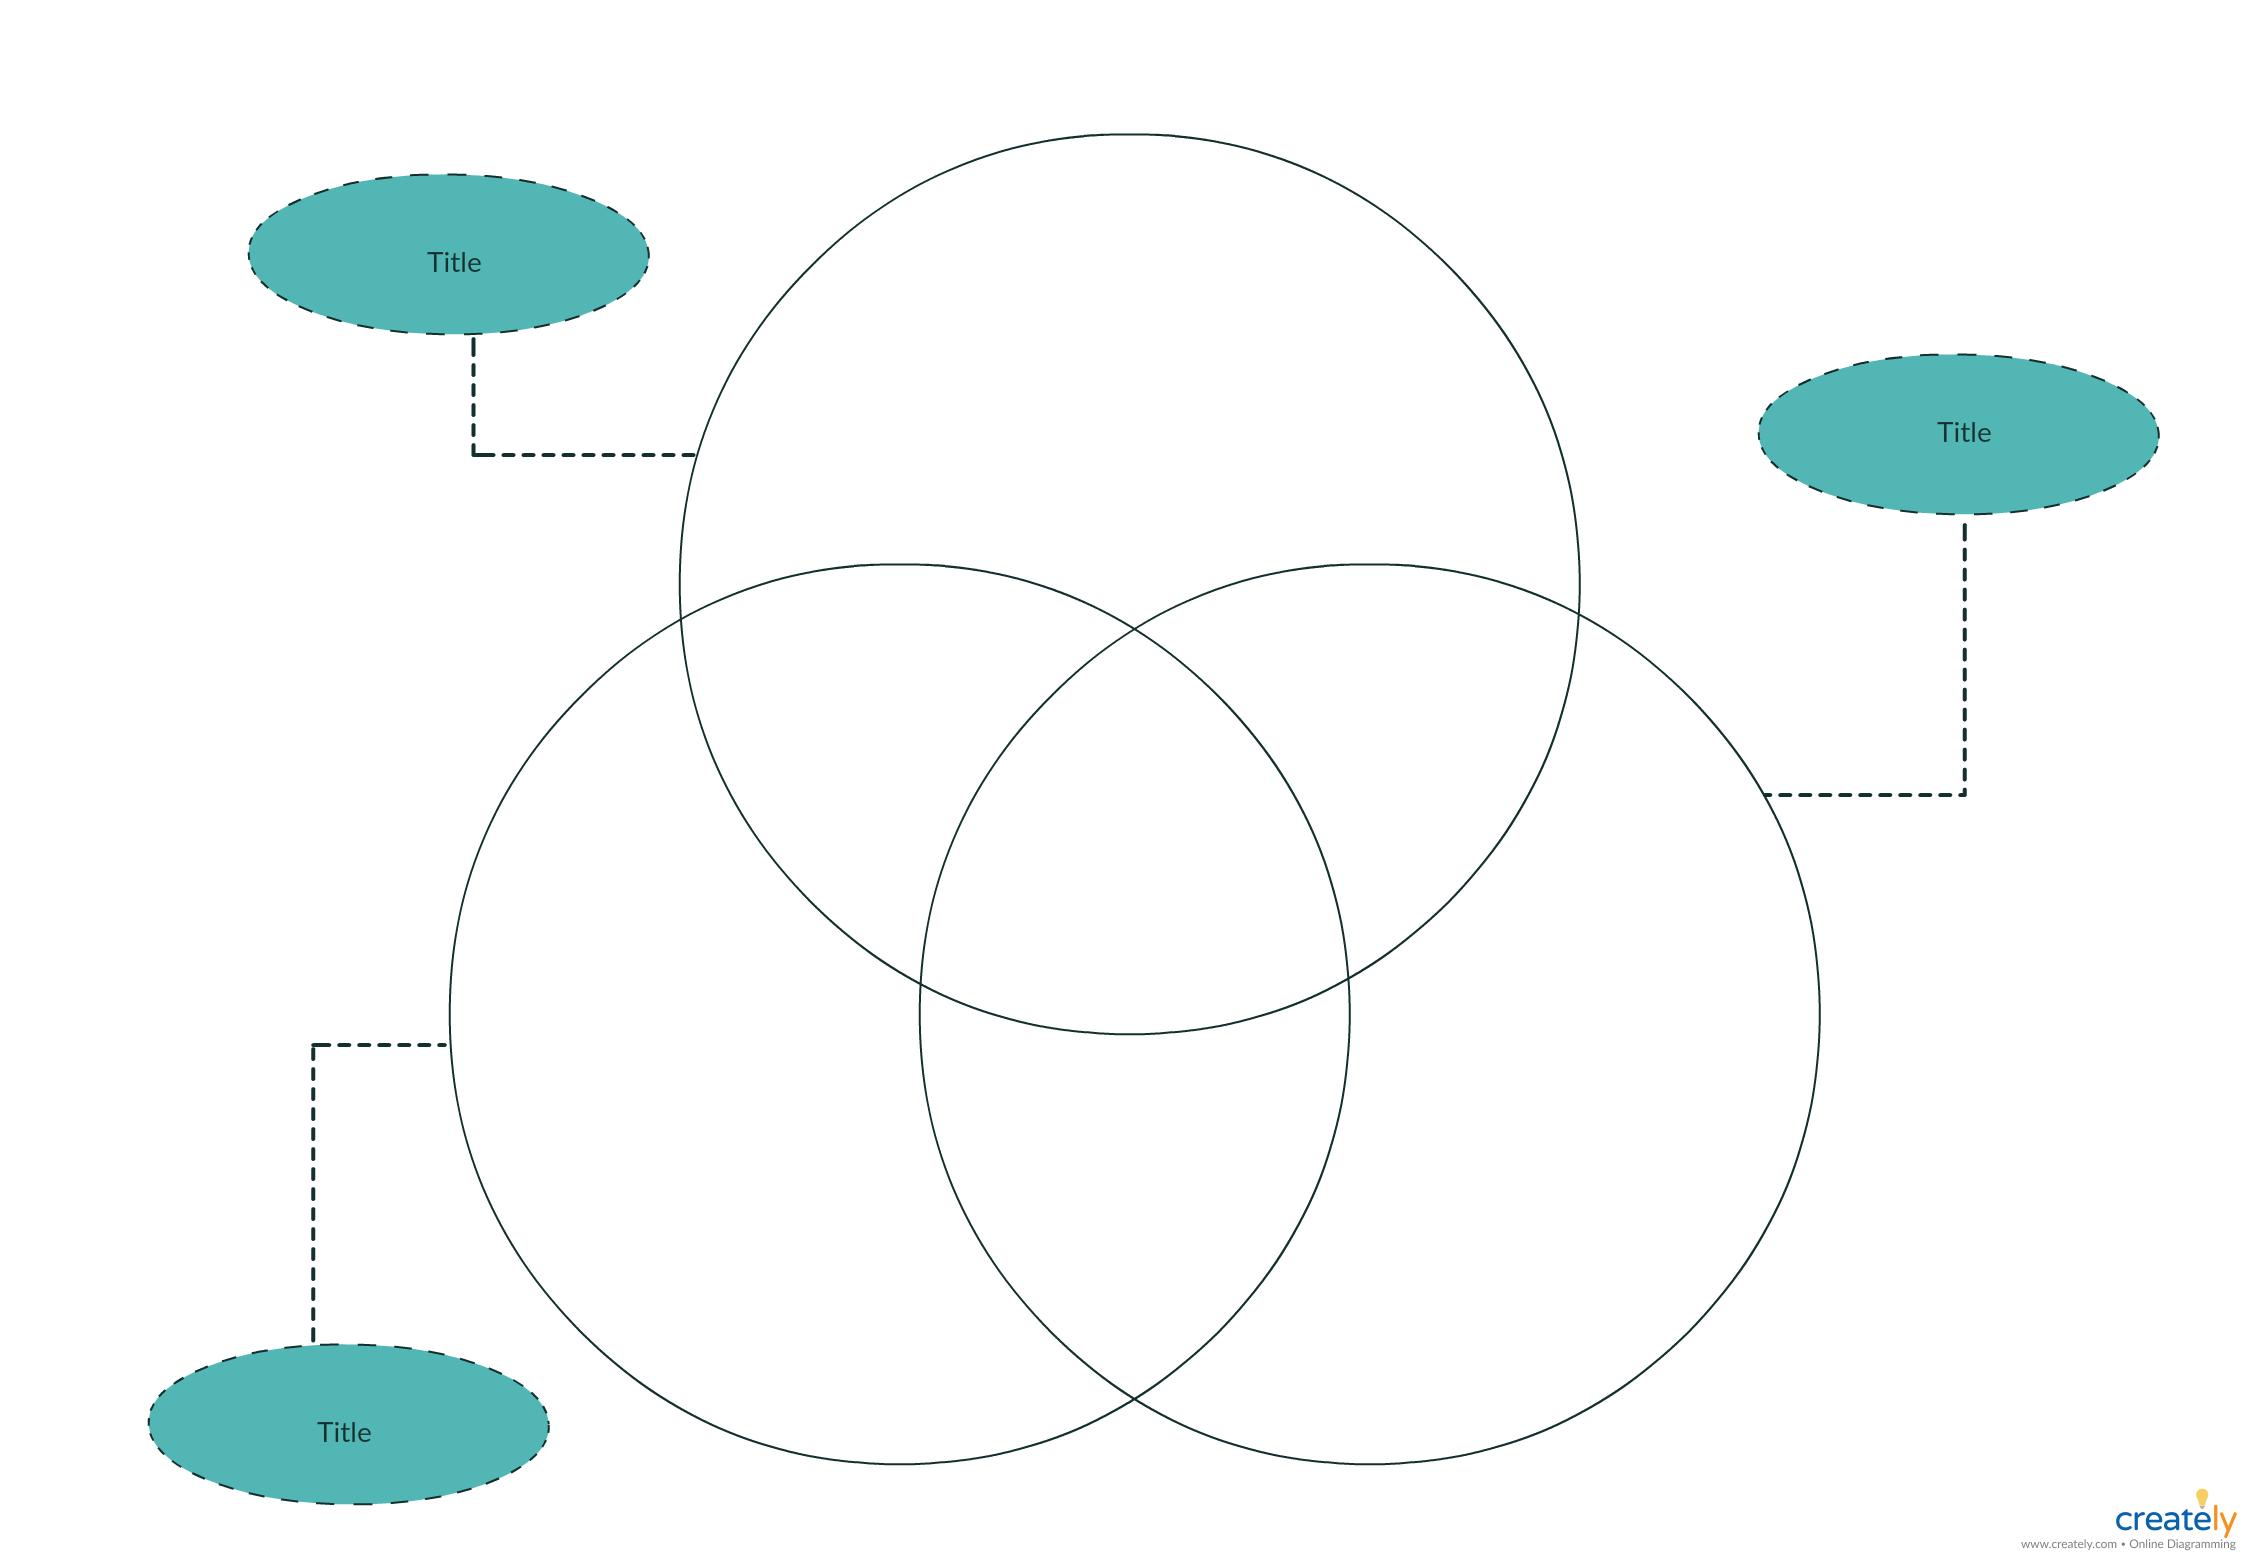 3 Set Venn Diagram Venn Diagram Template 3 Circle Venn Diagram Venn Diagram